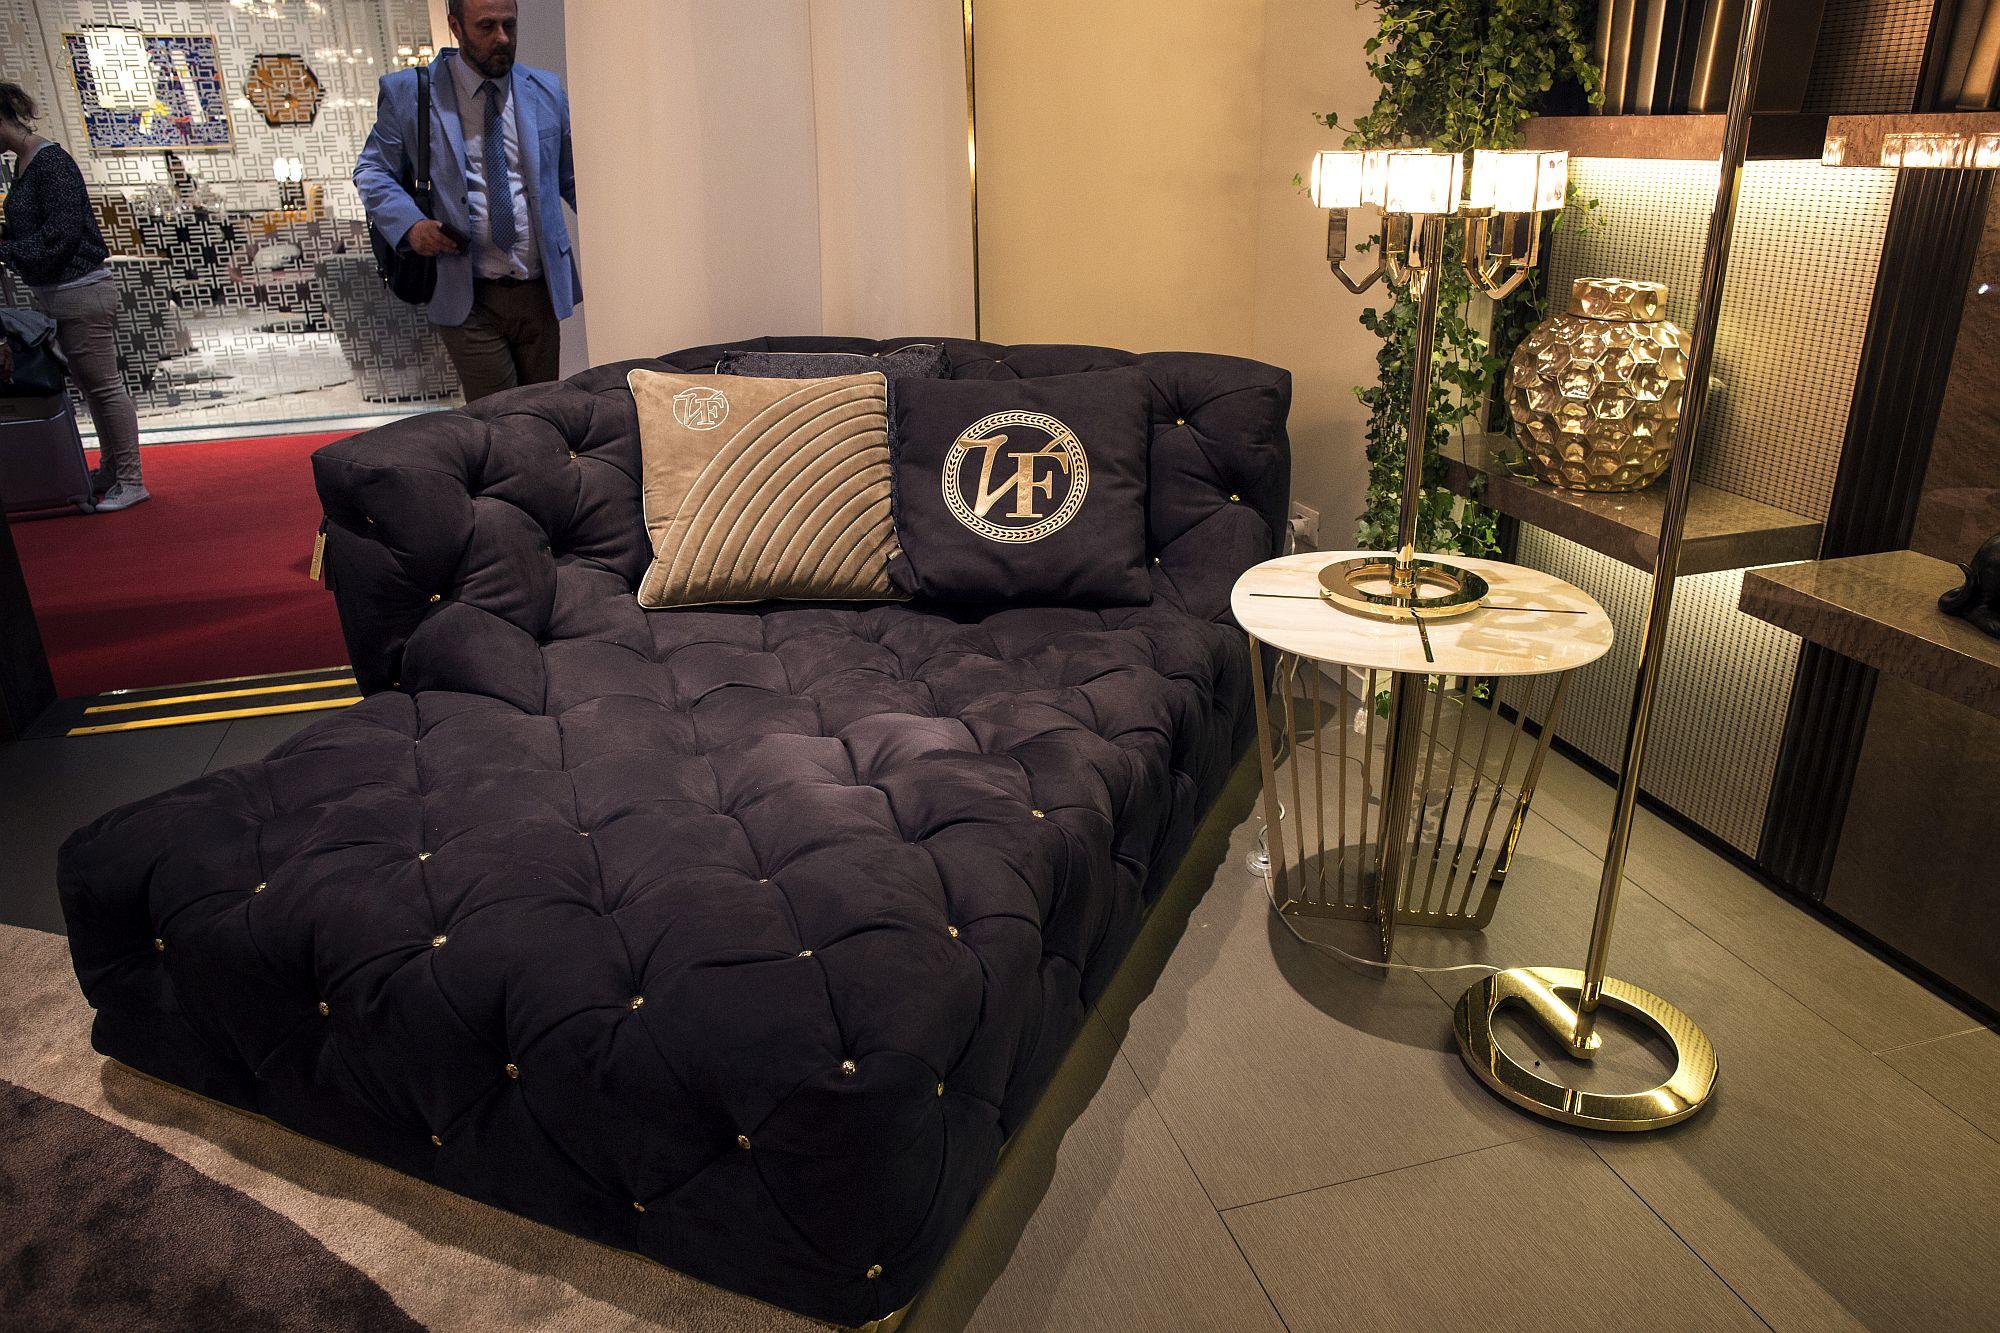 Sleek-side-table-and-floor-lamp-usher-in-the-glitter-of-metallic-finish